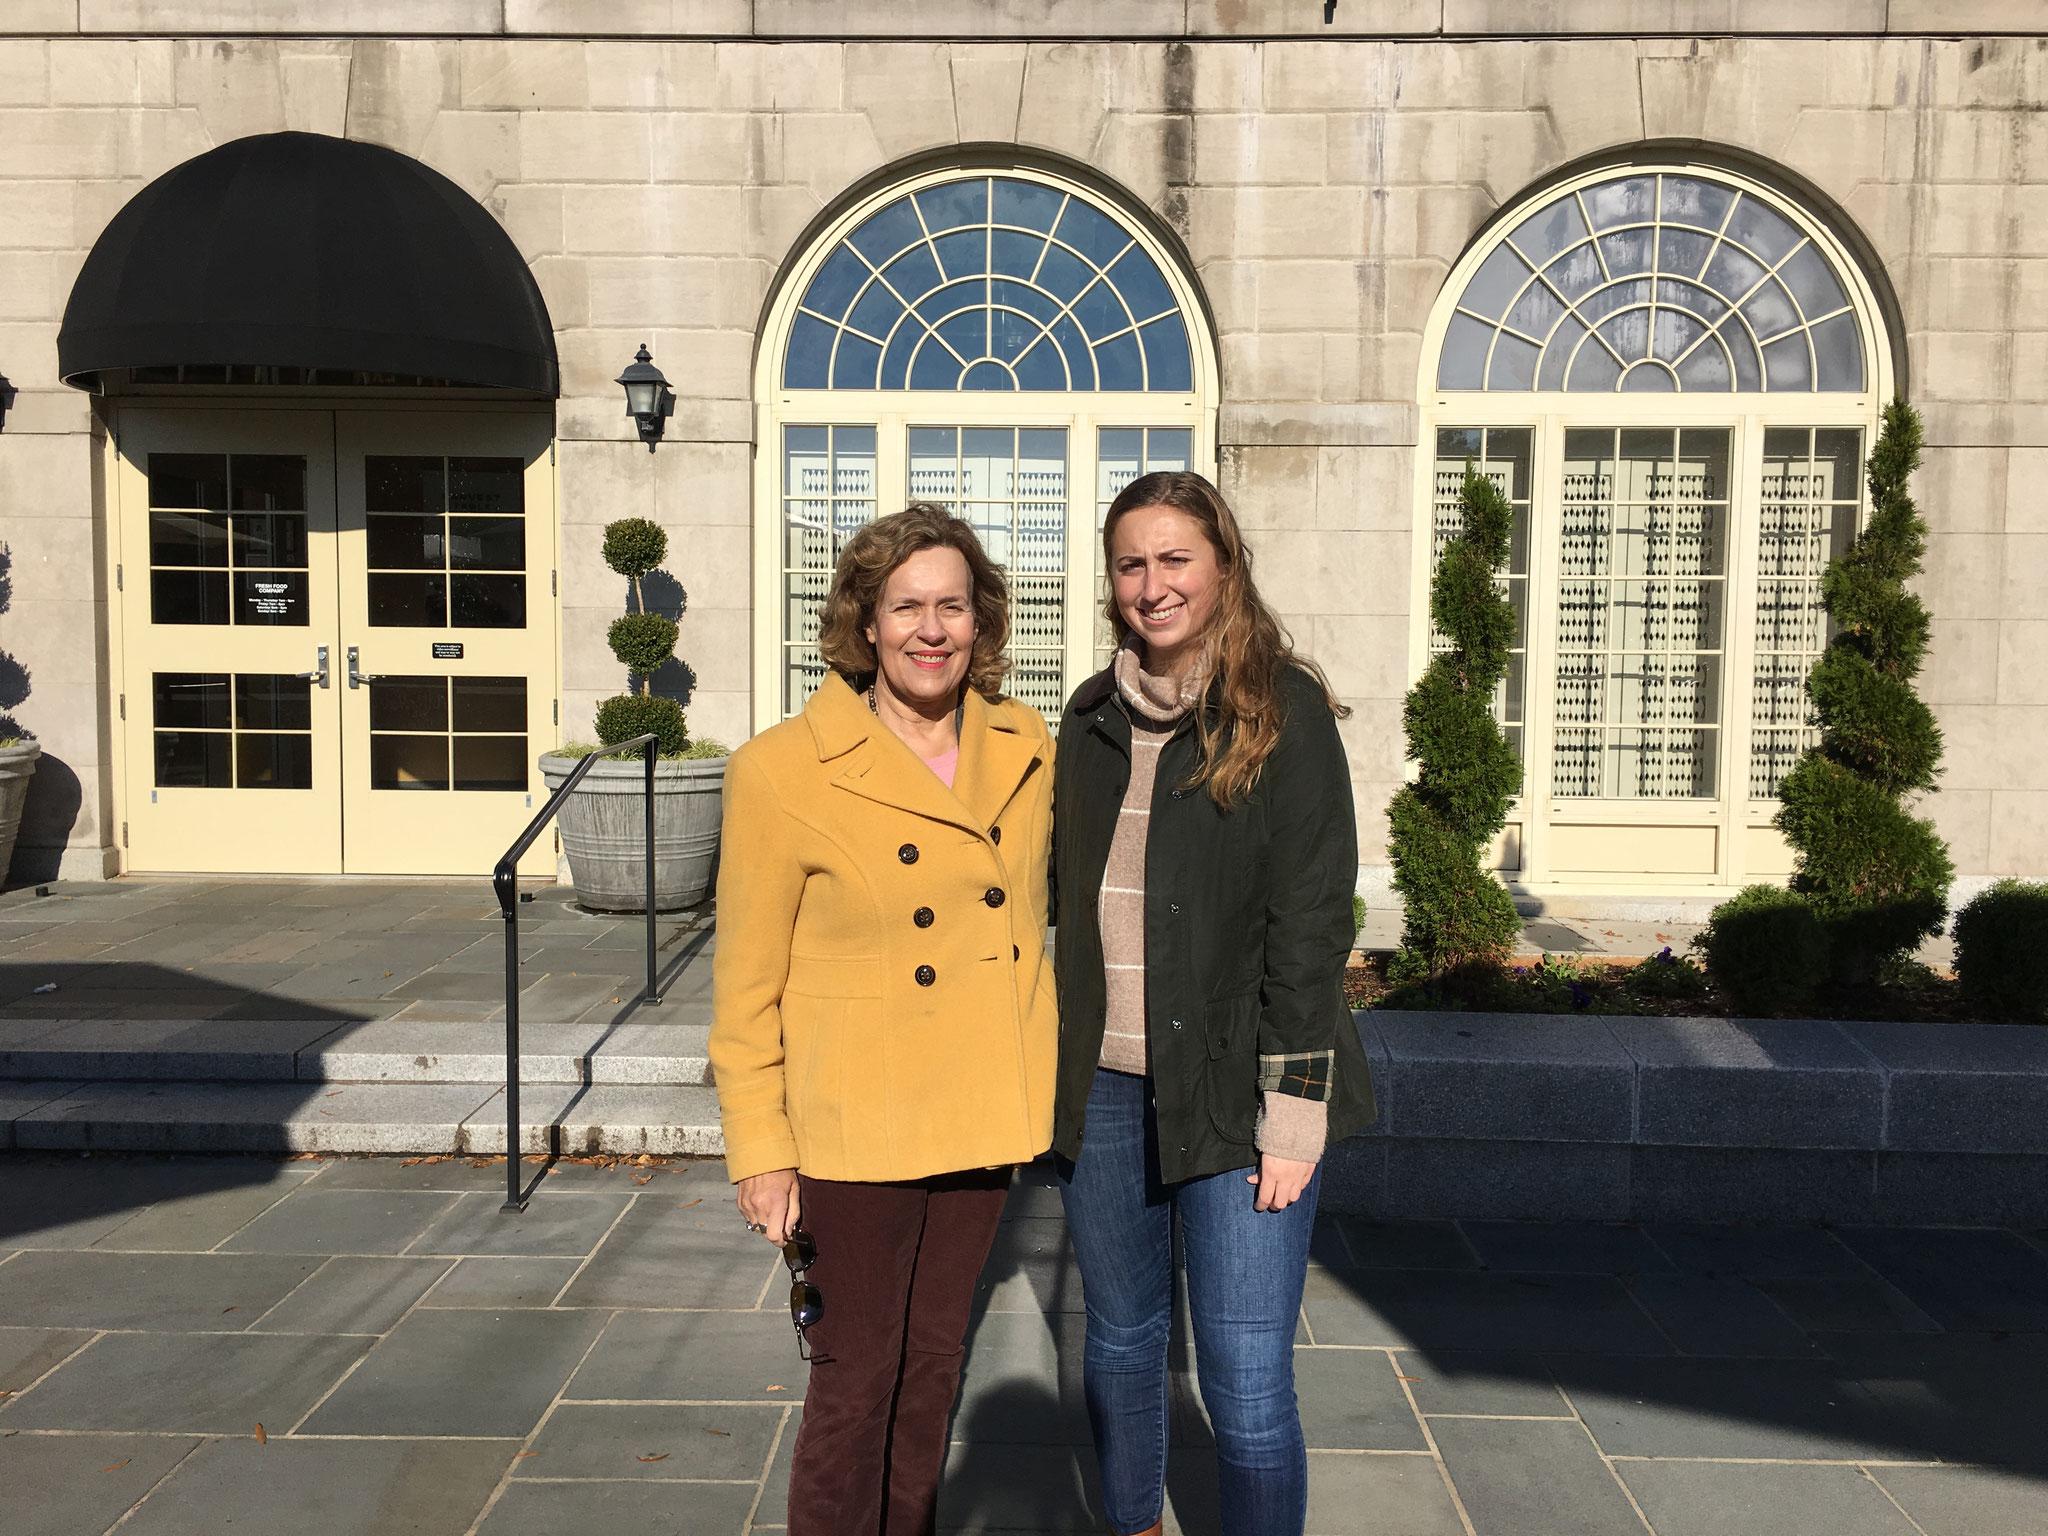 Lorraine & Emma Kagel, 11-2018, Wake Forest, NC